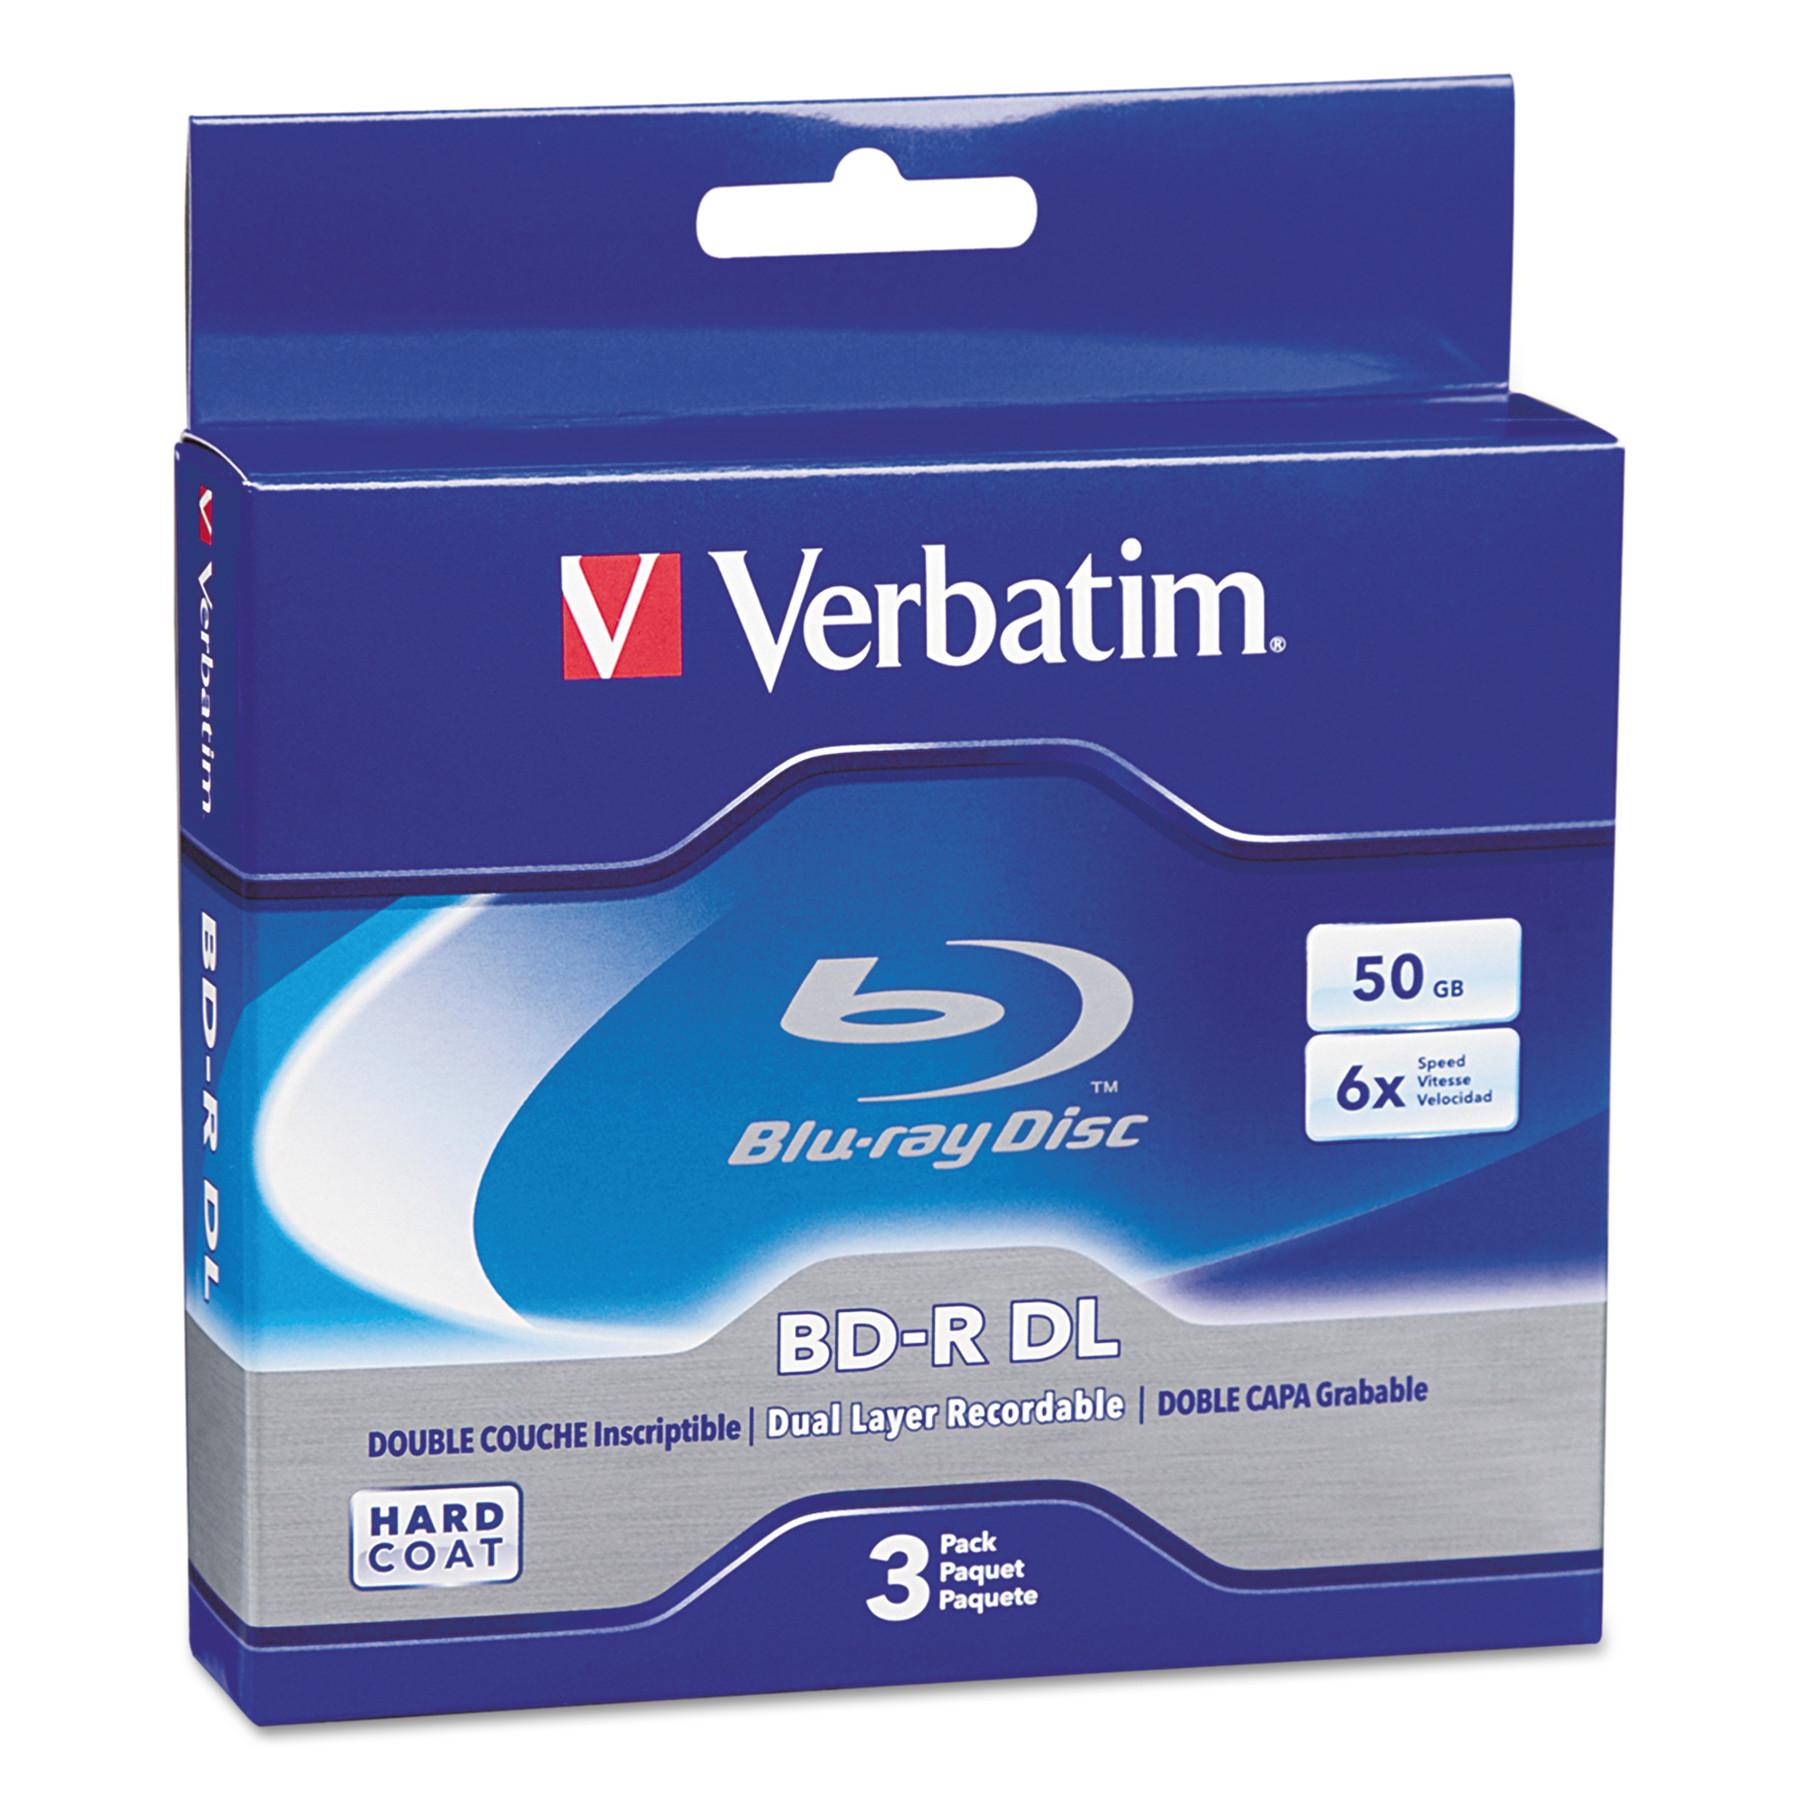 Verbatim Blu-Ray BD-R Dual-Layer, 50 GB, 3/Pk -VER97237